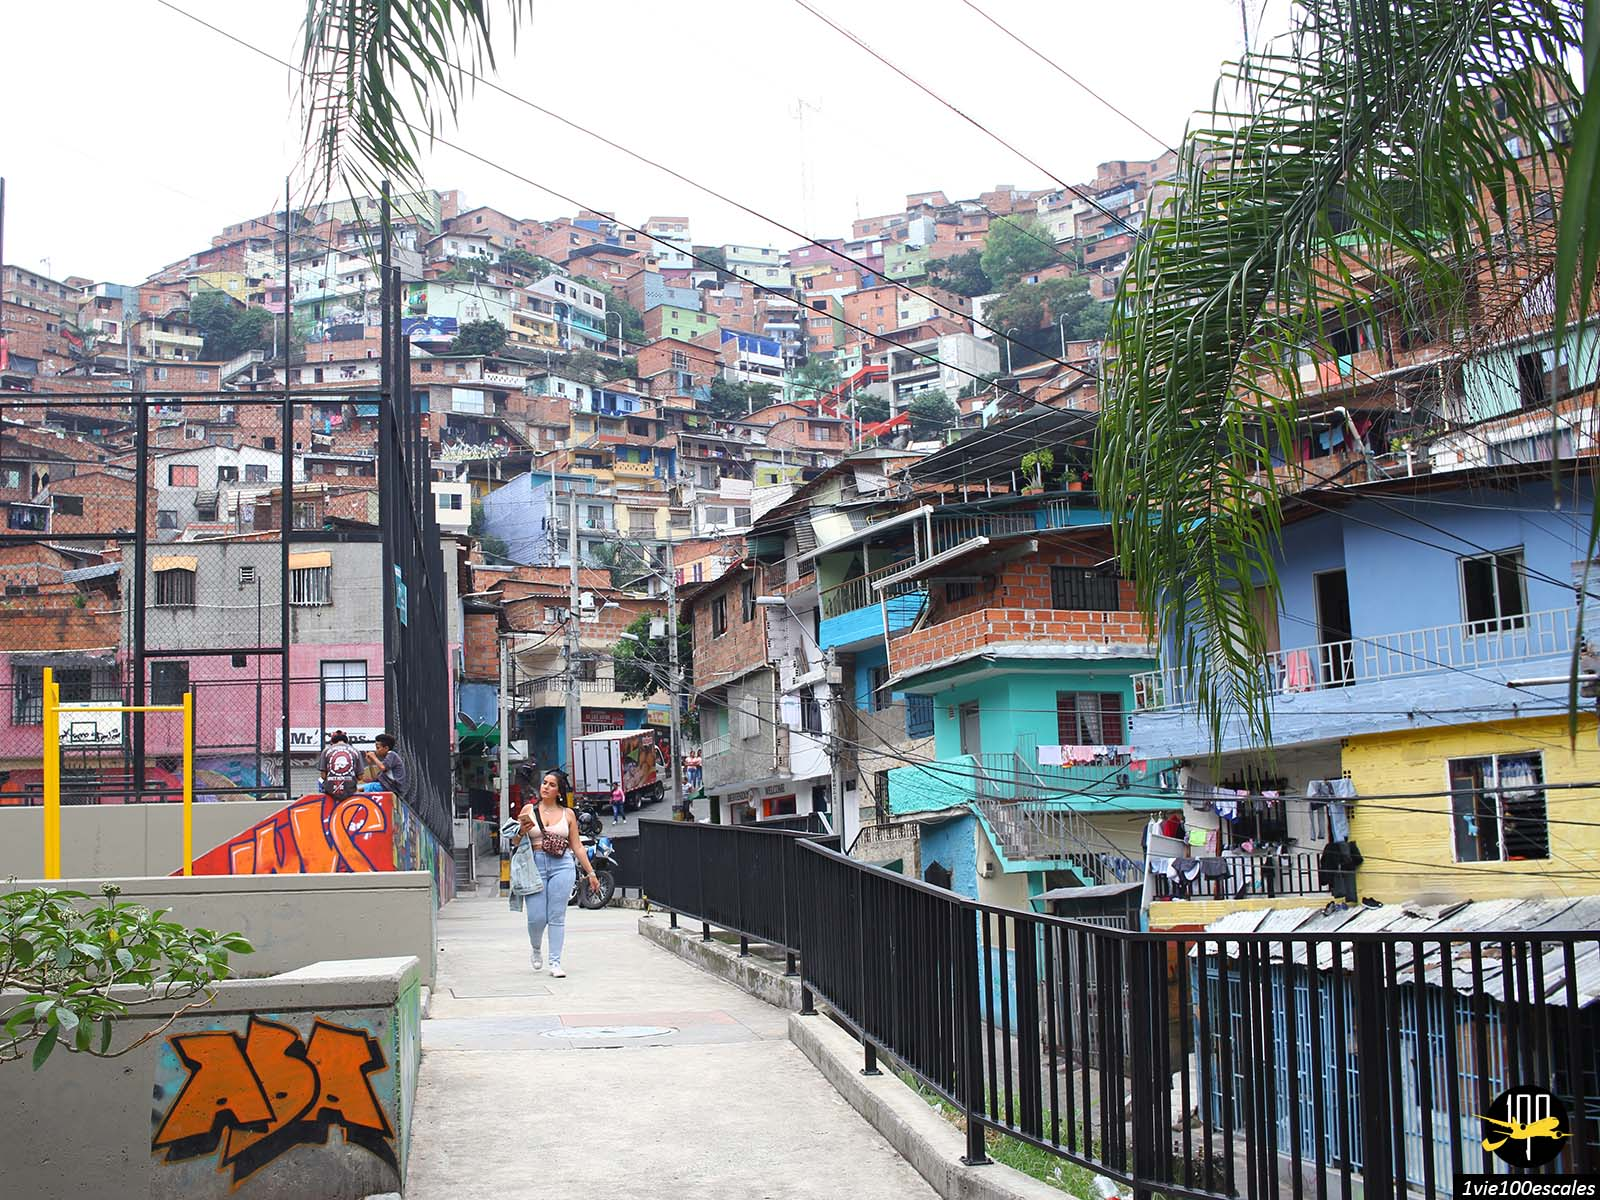 Escale #120 Medellín